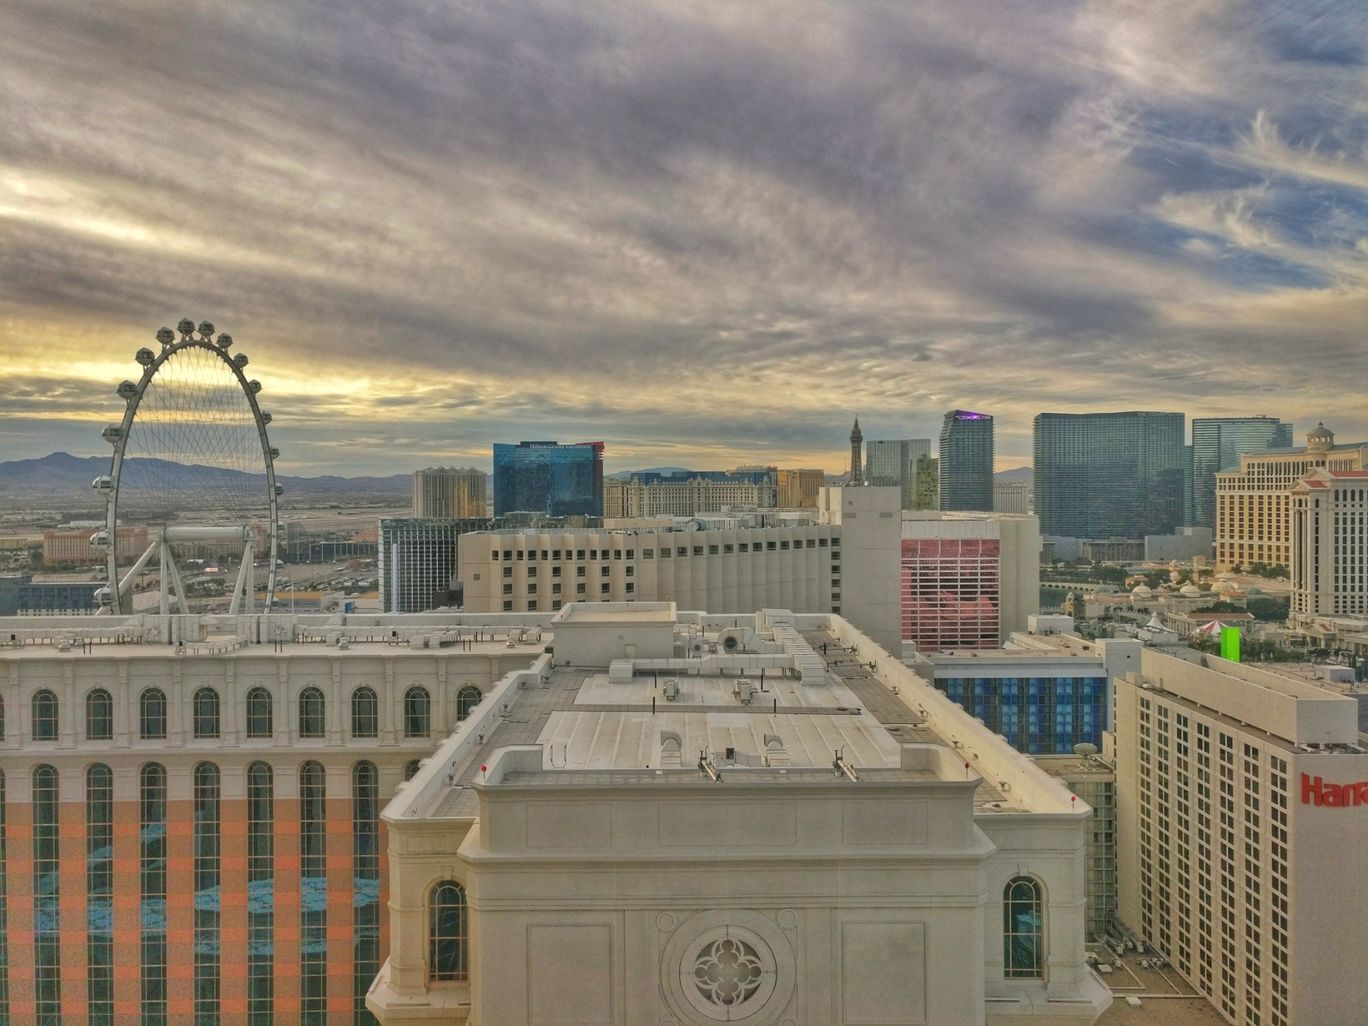 Photo of Las Vegas By Anay Pathak